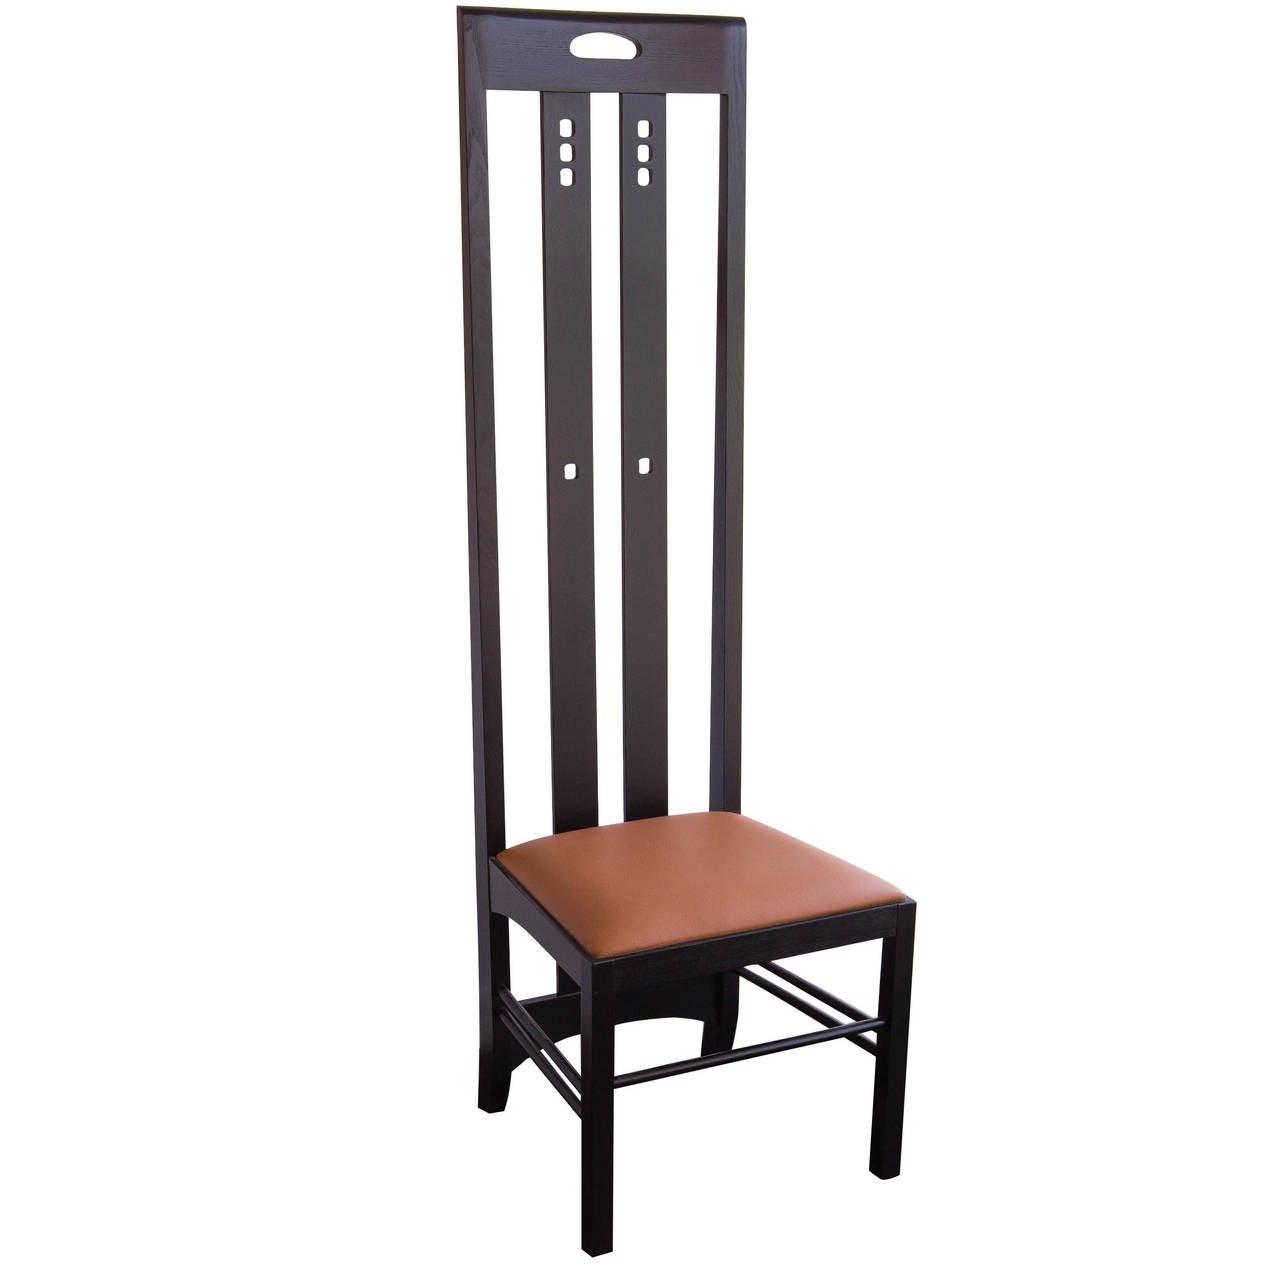 Charles Rennie Mackintosh Ingram Chair By Cassina At 1stdibs